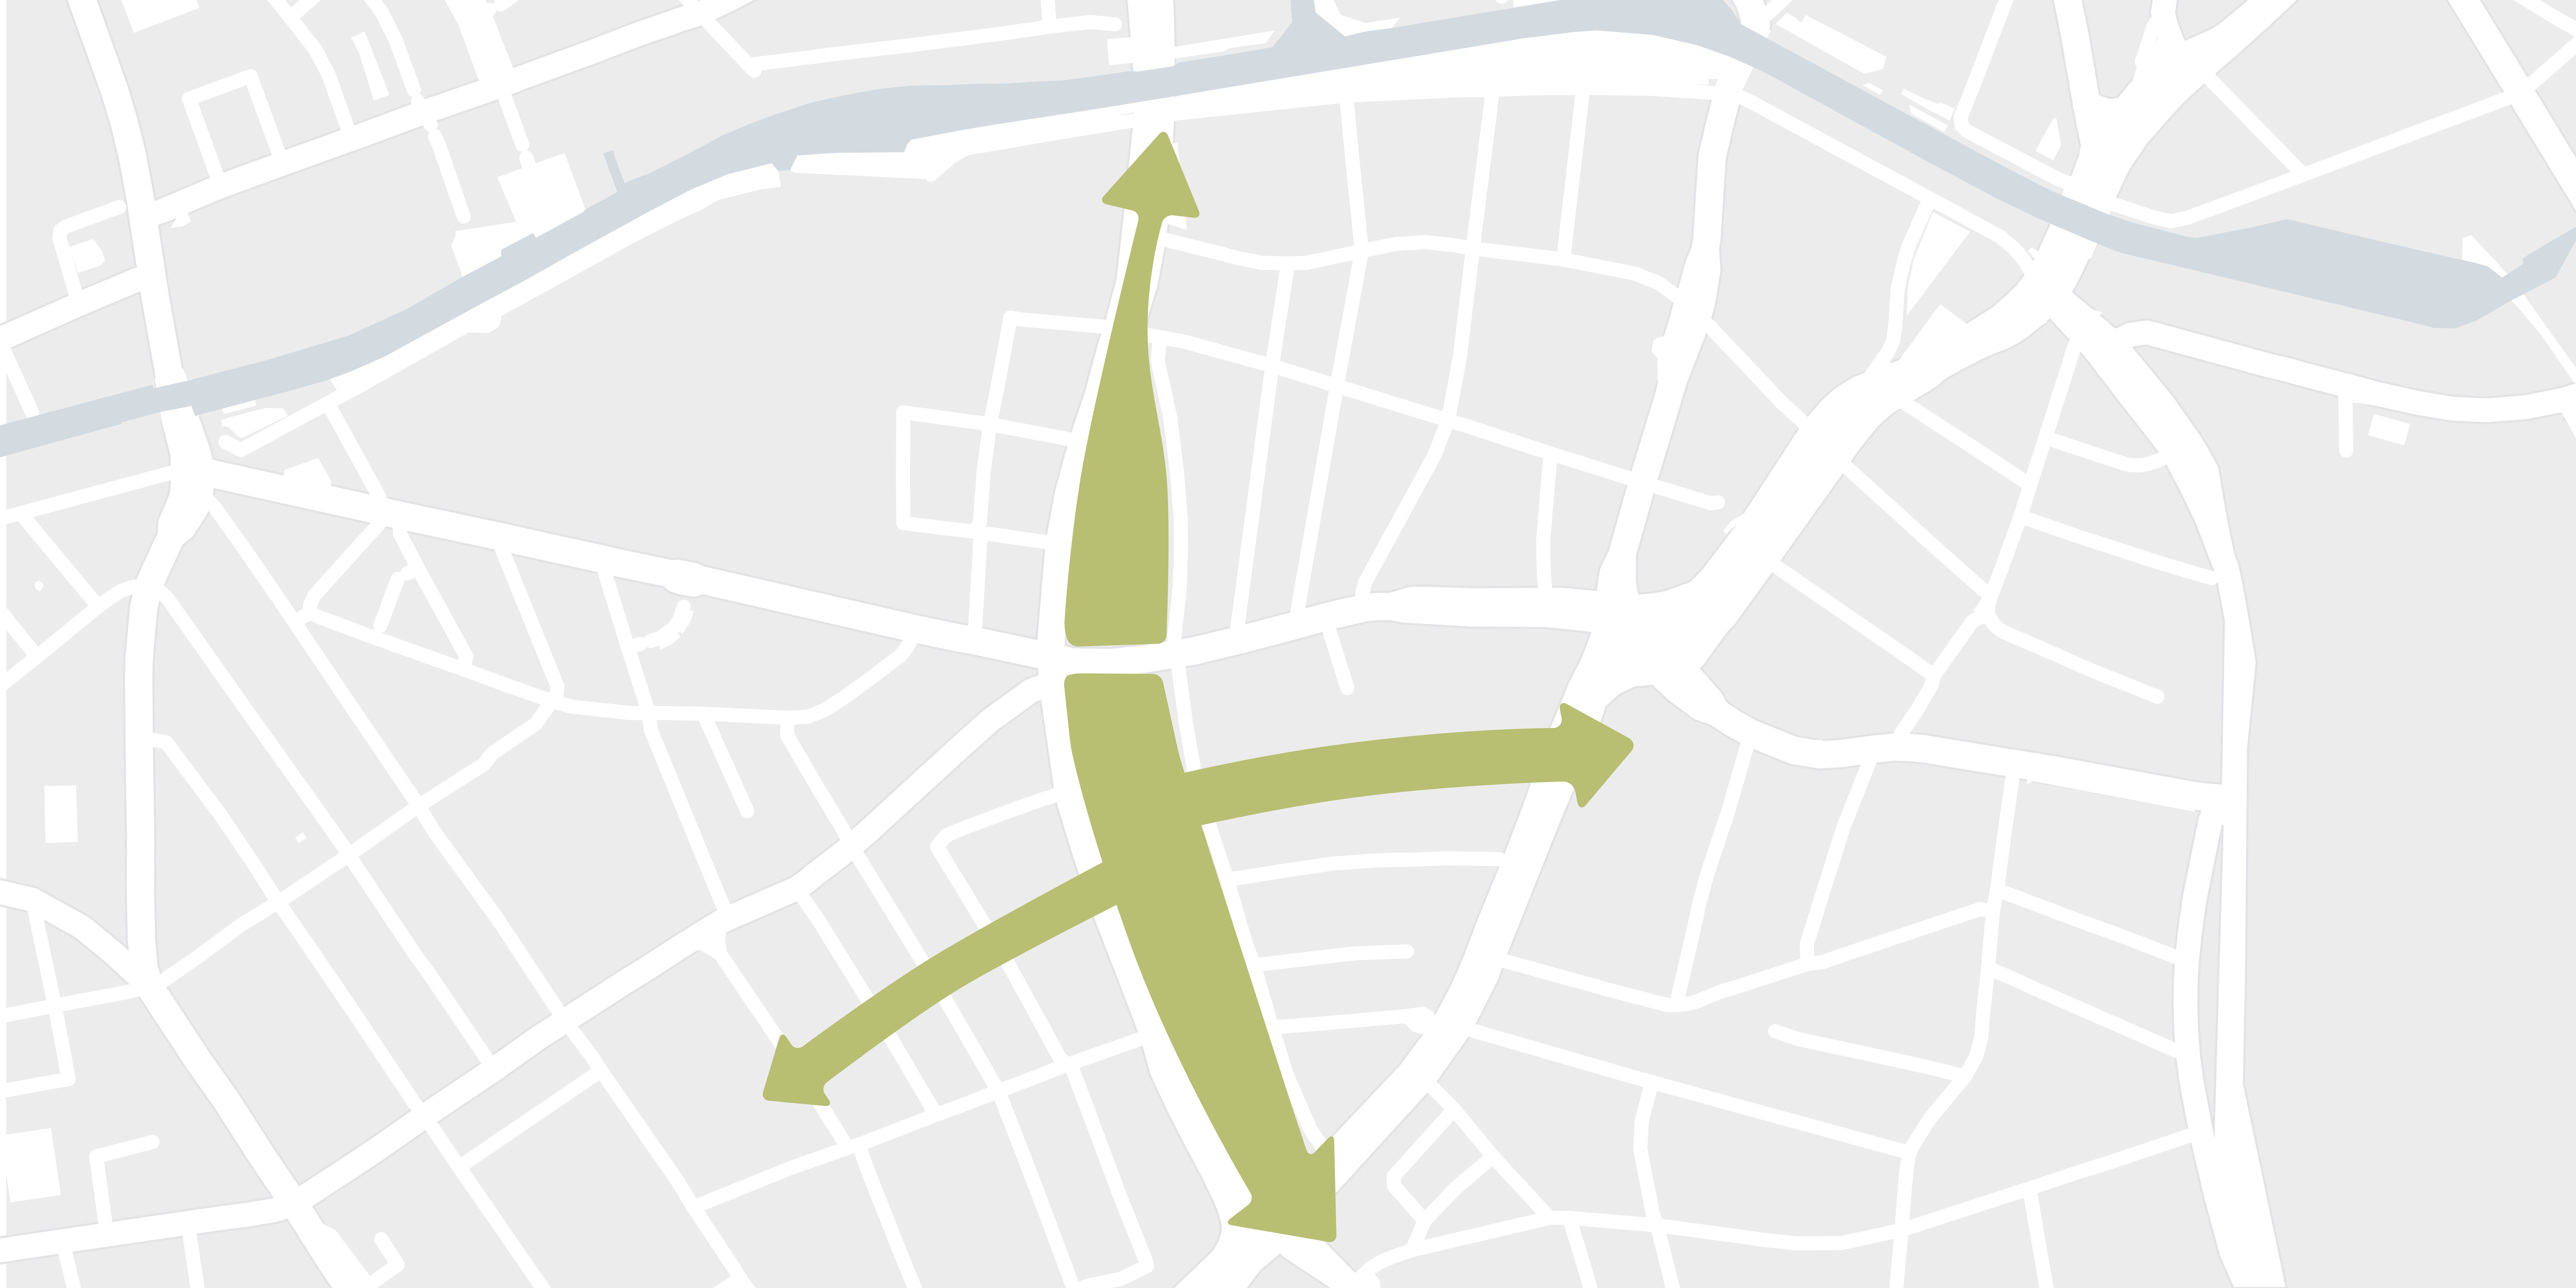 Mesterkamp Hamburg Diagramm Typologie Grün Freiraum